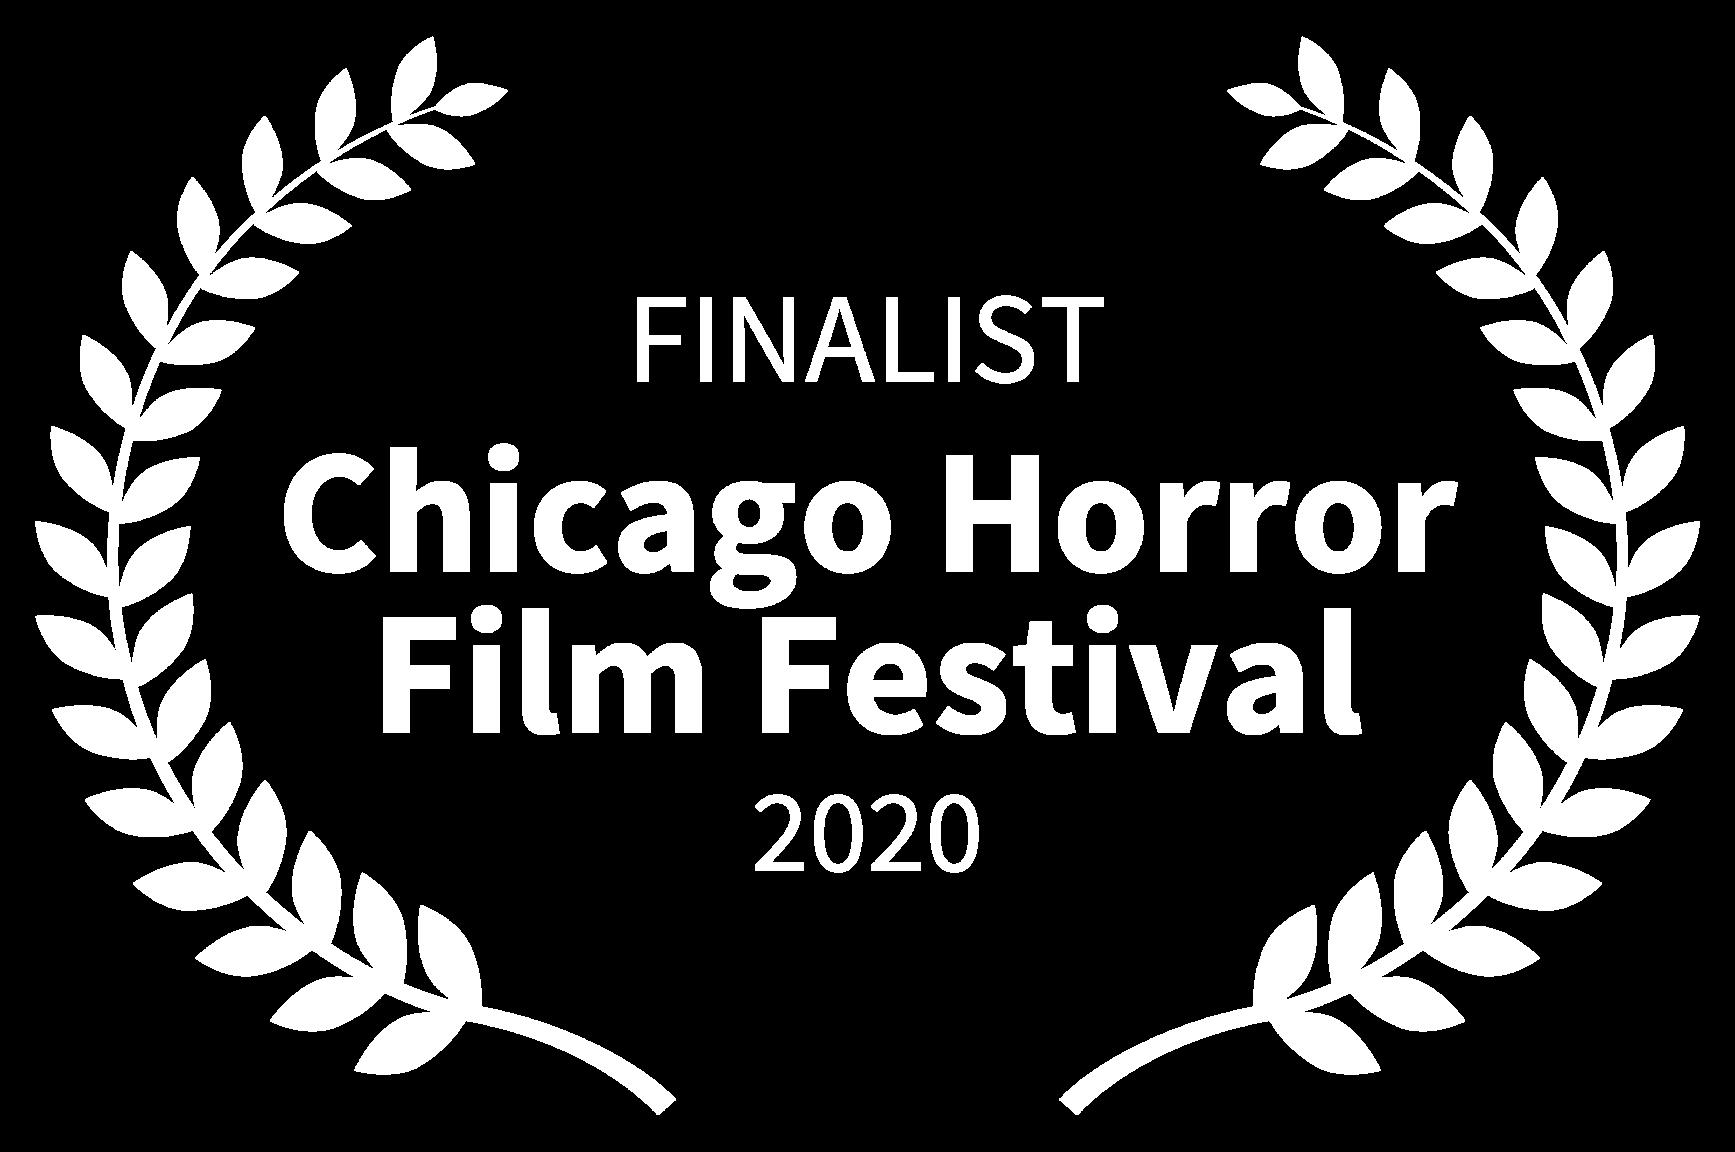 FINALIST - Chicago Horror Film Festival - 2020